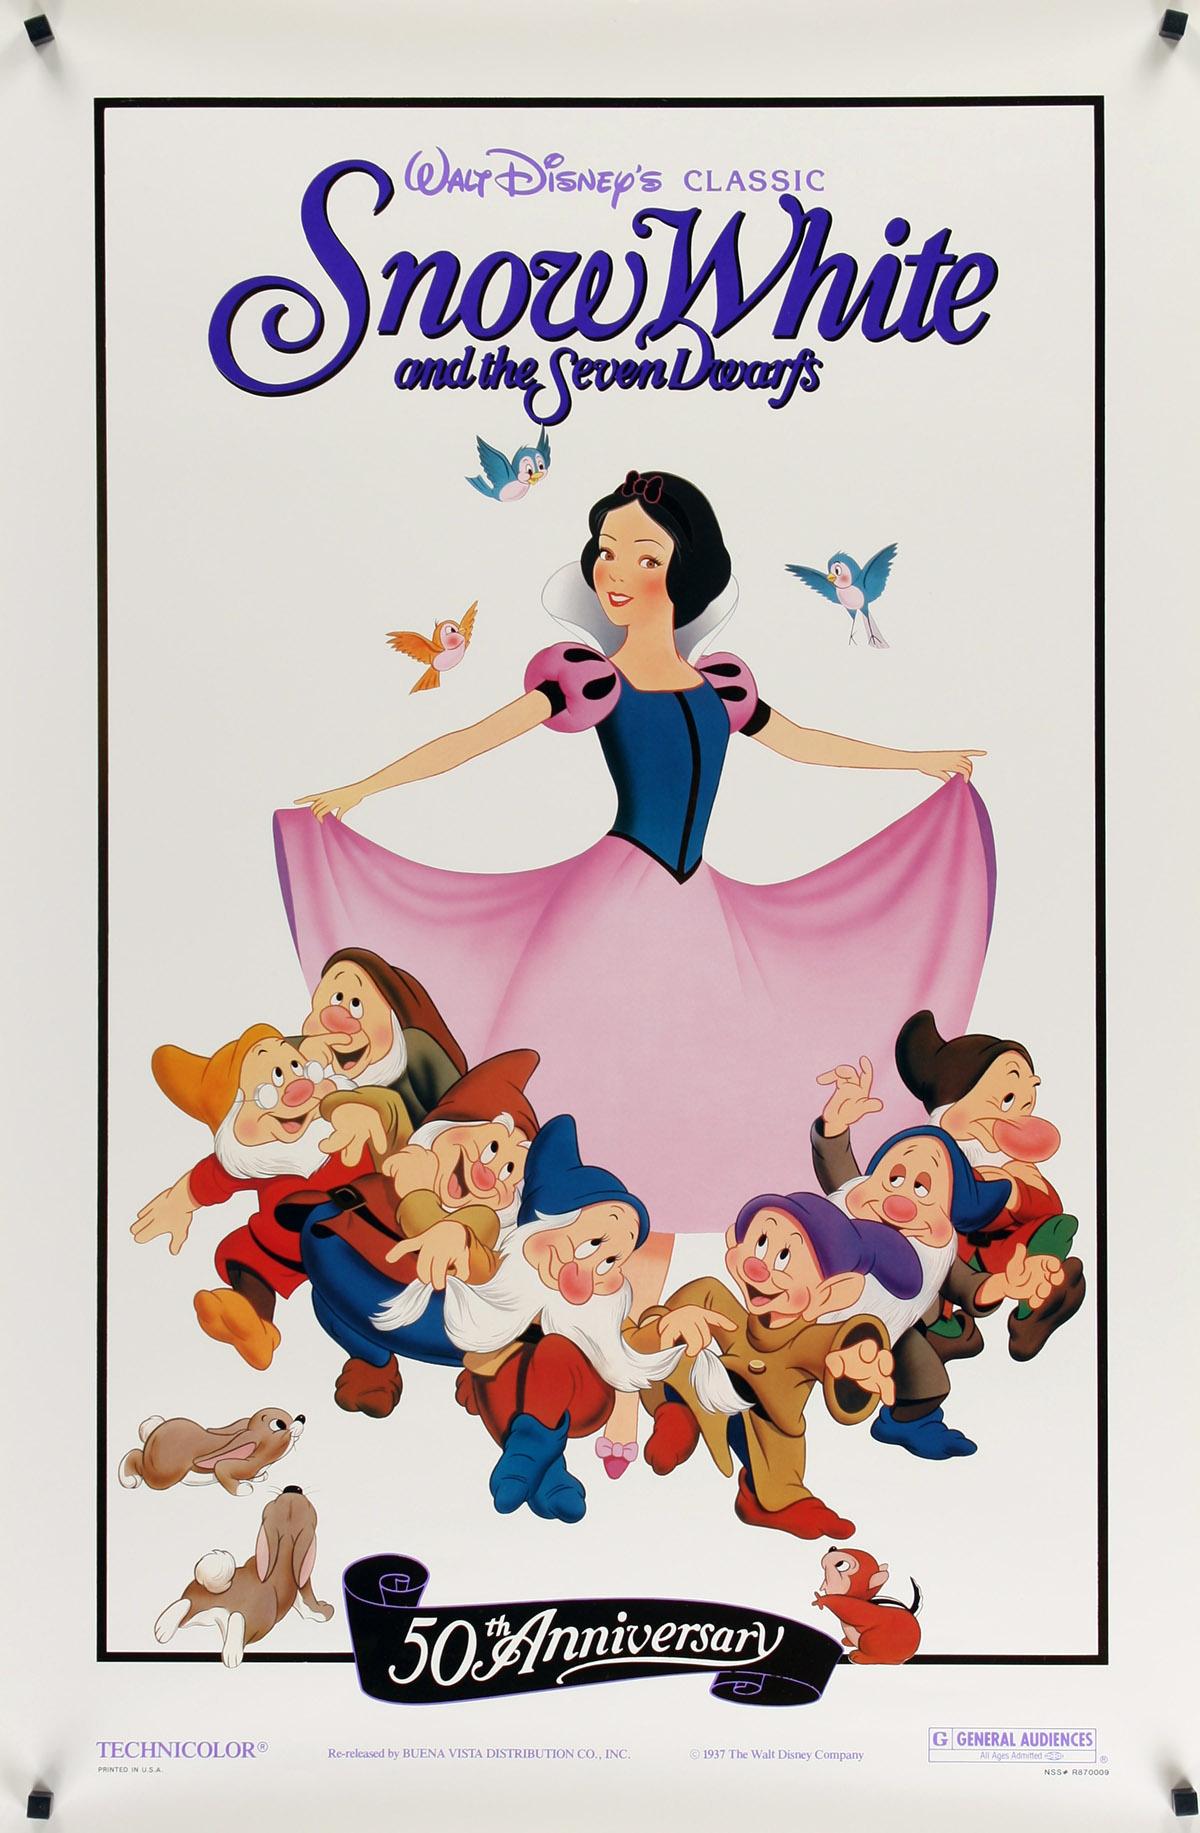 SNOW WHITE THE SEVEN DWARFS Foil Movie Poster R87 Walt Disney Animated Cartoon Fantasy Classic